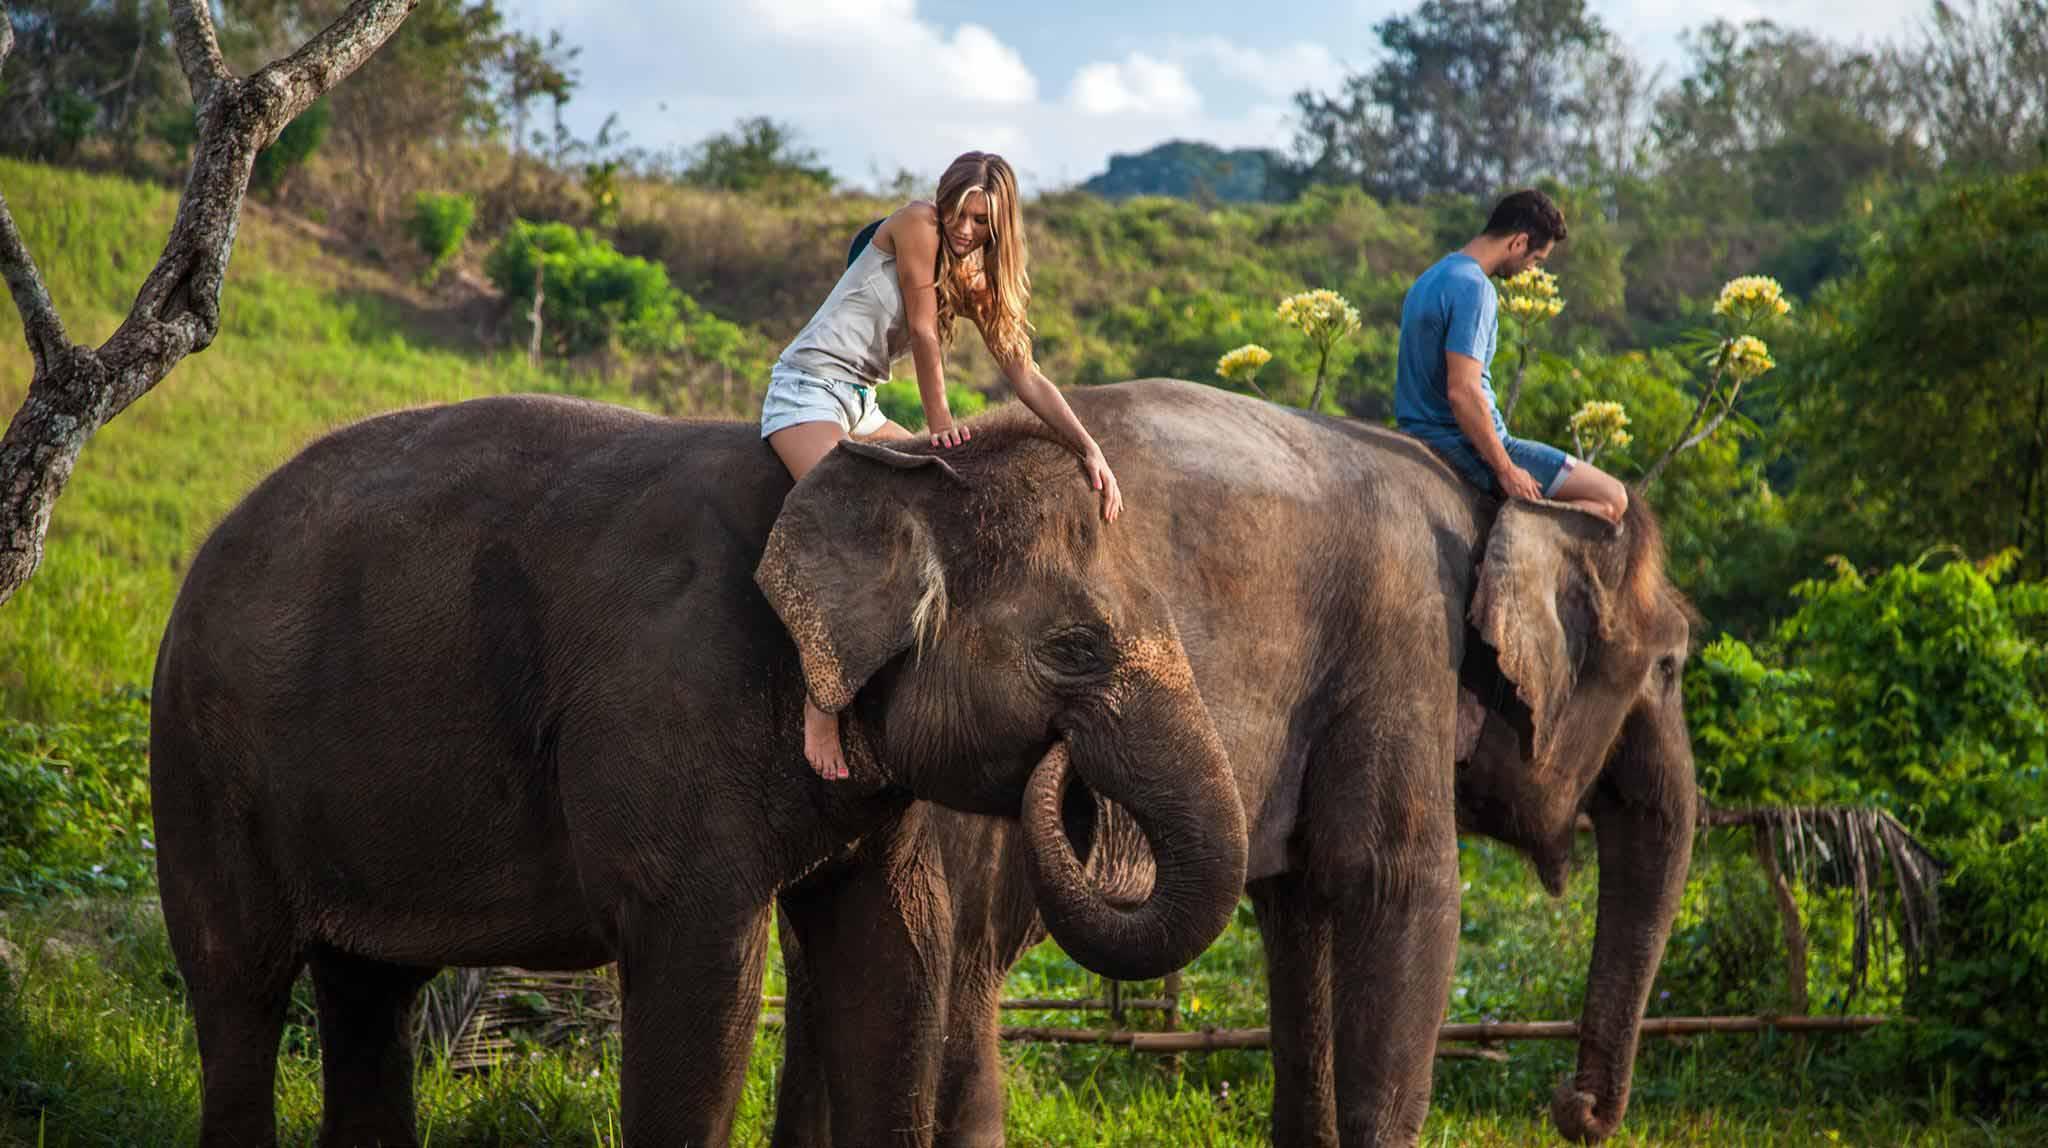 Bali's Wild Side - Animal Parks in Bali